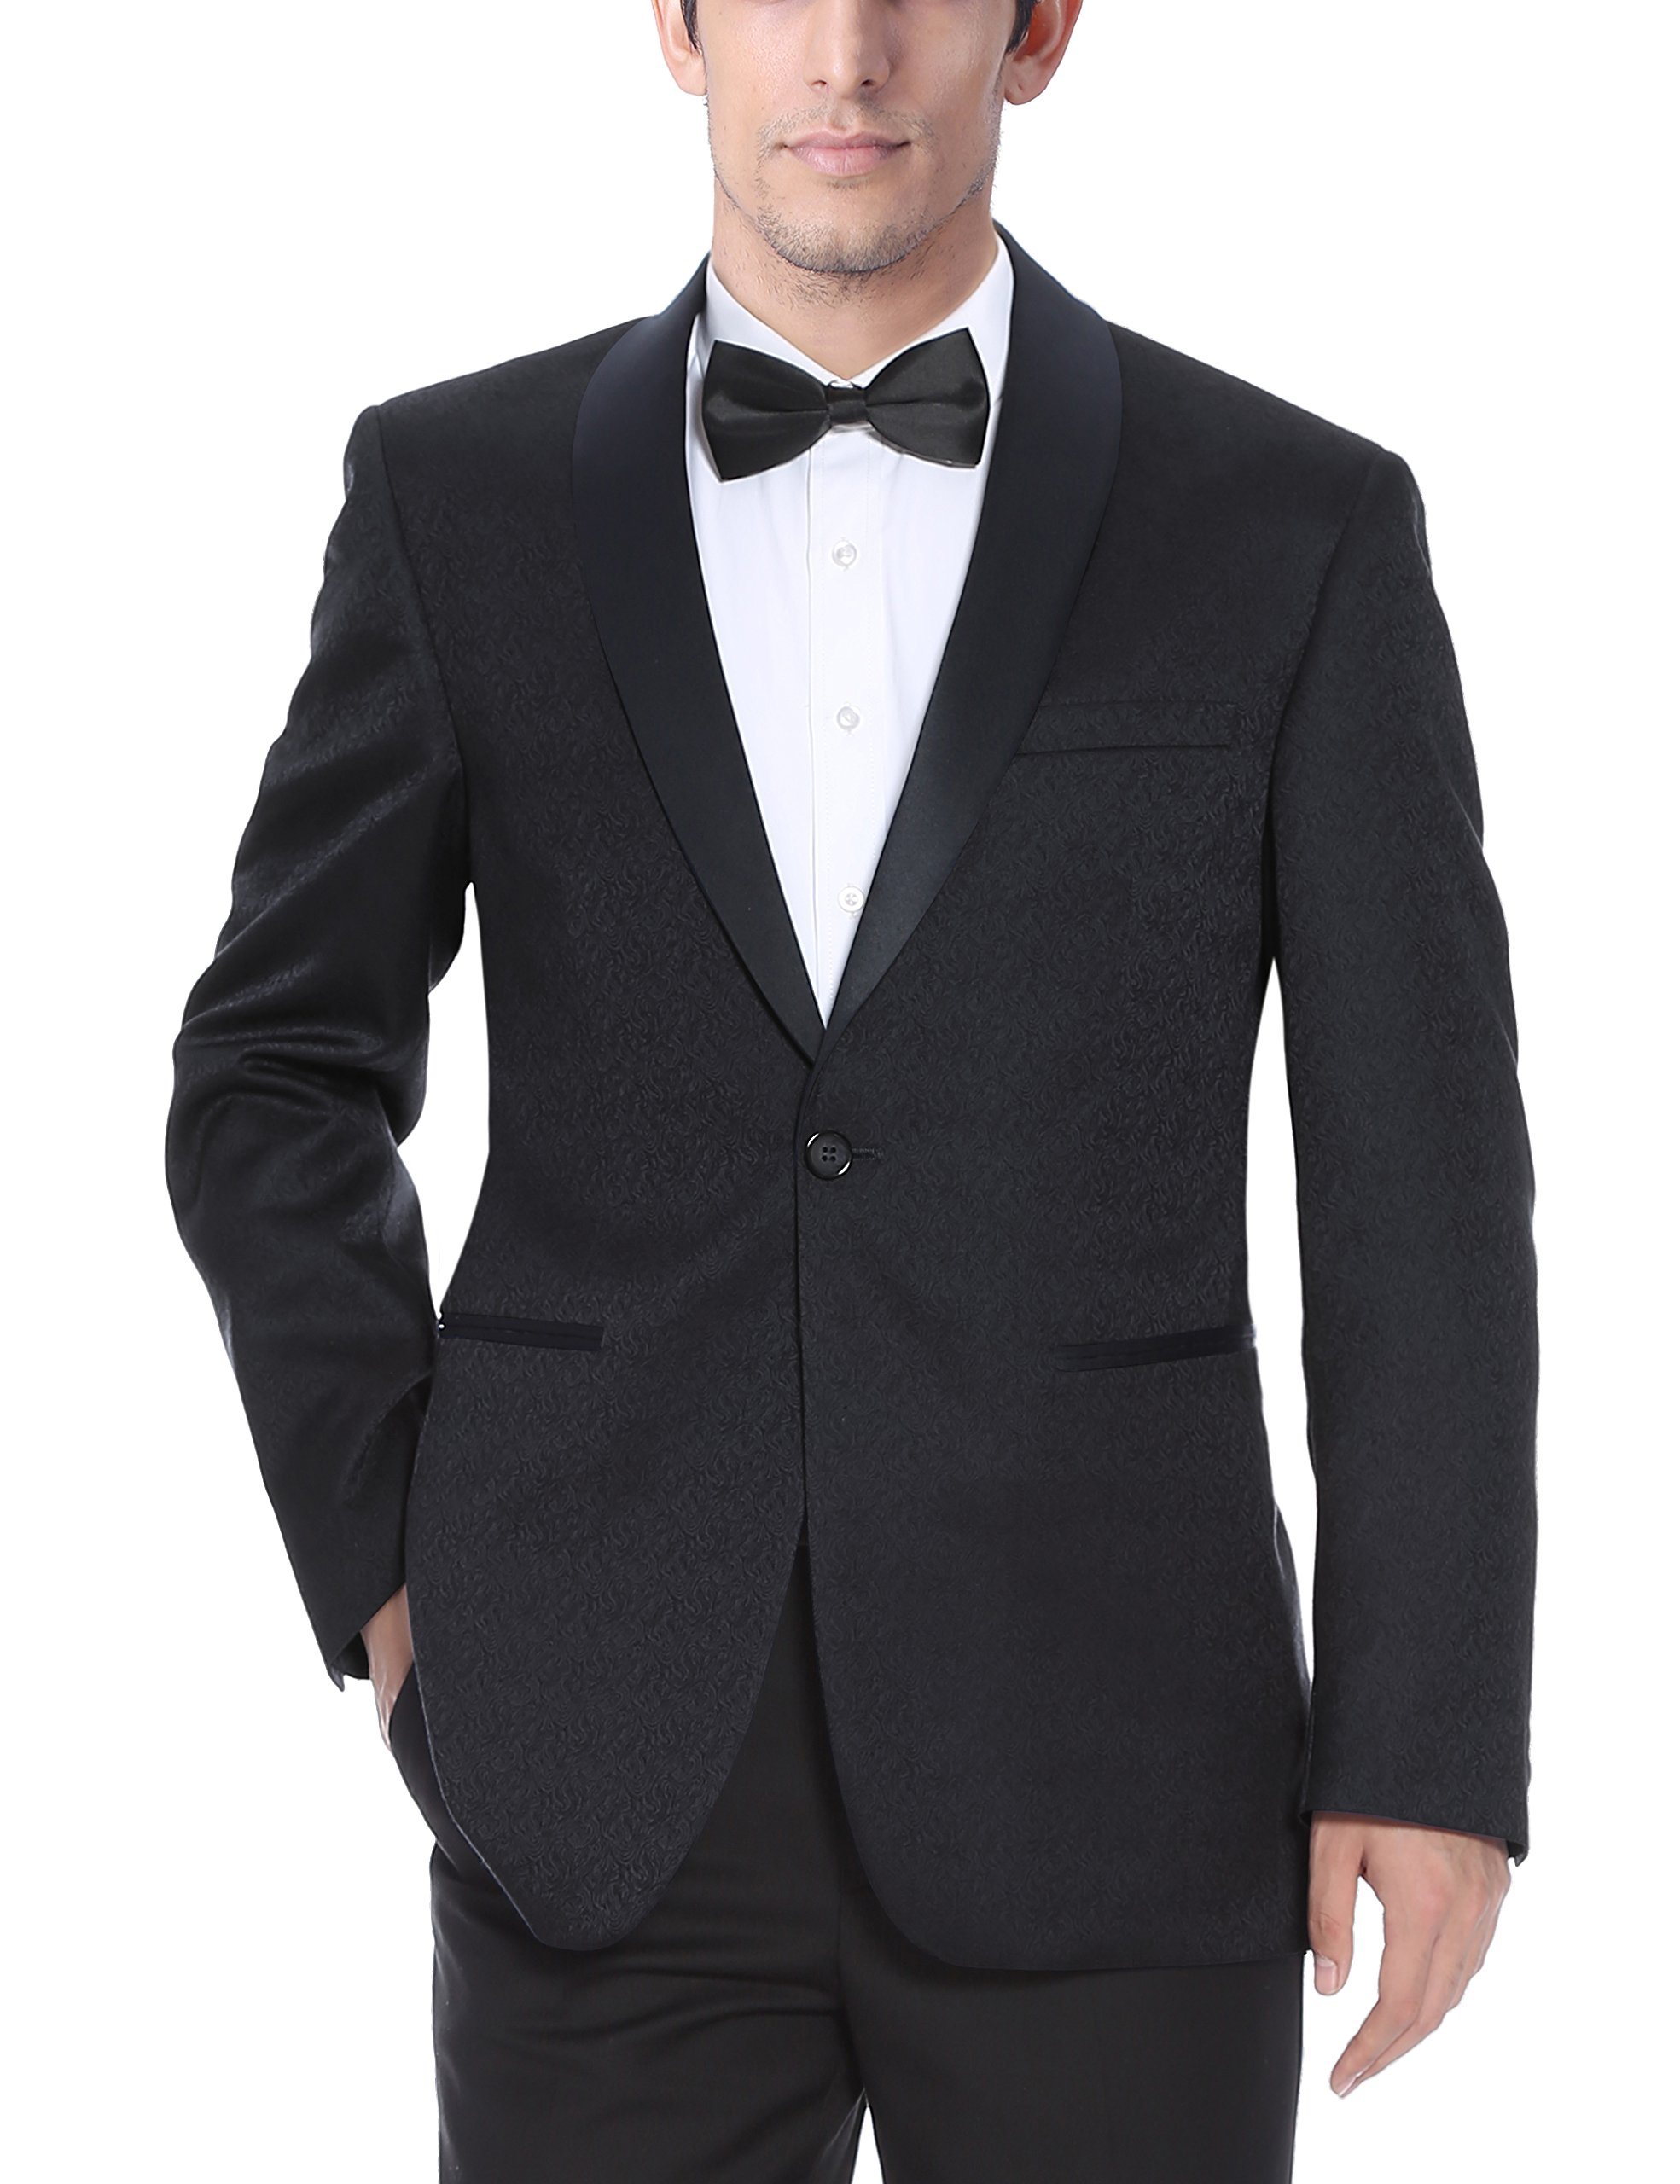 Chama Mens Black & Navy Blue Textured Tuxedo Dinner Jacket Blazer with Shawl Collar (Black, 44L)